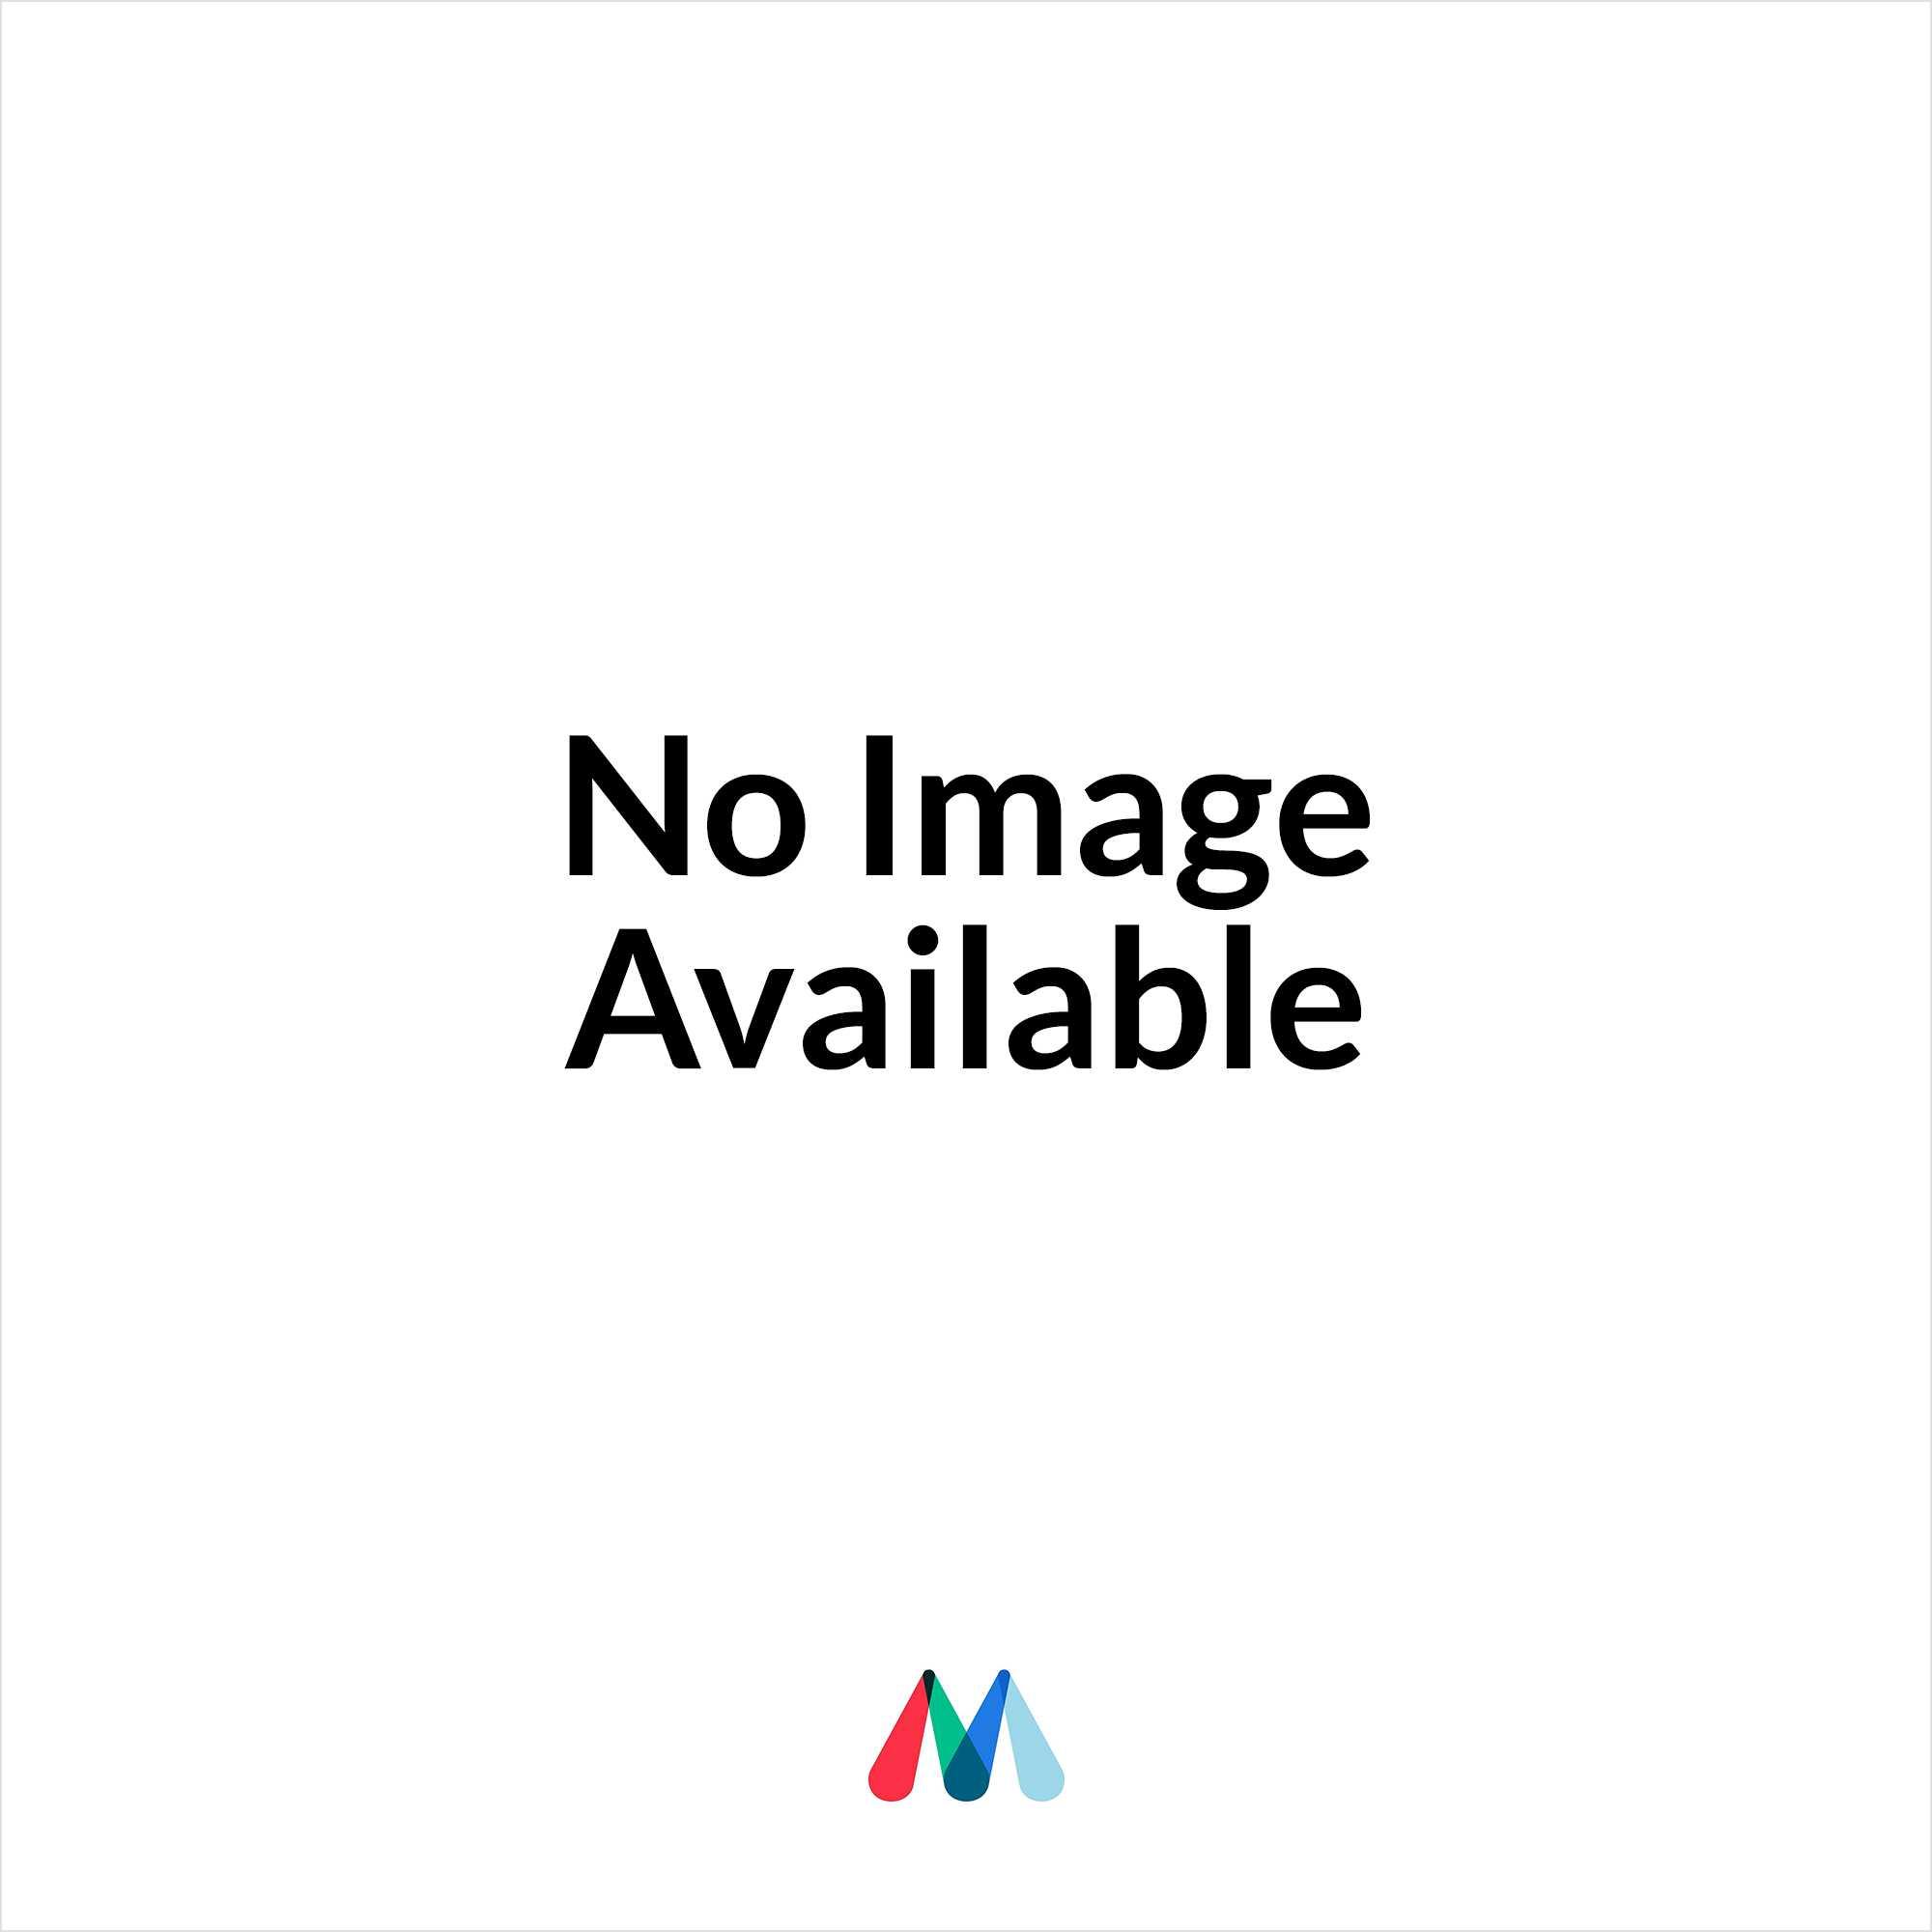 Steinel Sensor Lighting Steinel Sensor Lighting L 585 S Classic Globe Wall Light With 180 Degree Pir White Outdoor Lights From Moonlight Design Ltd Uk